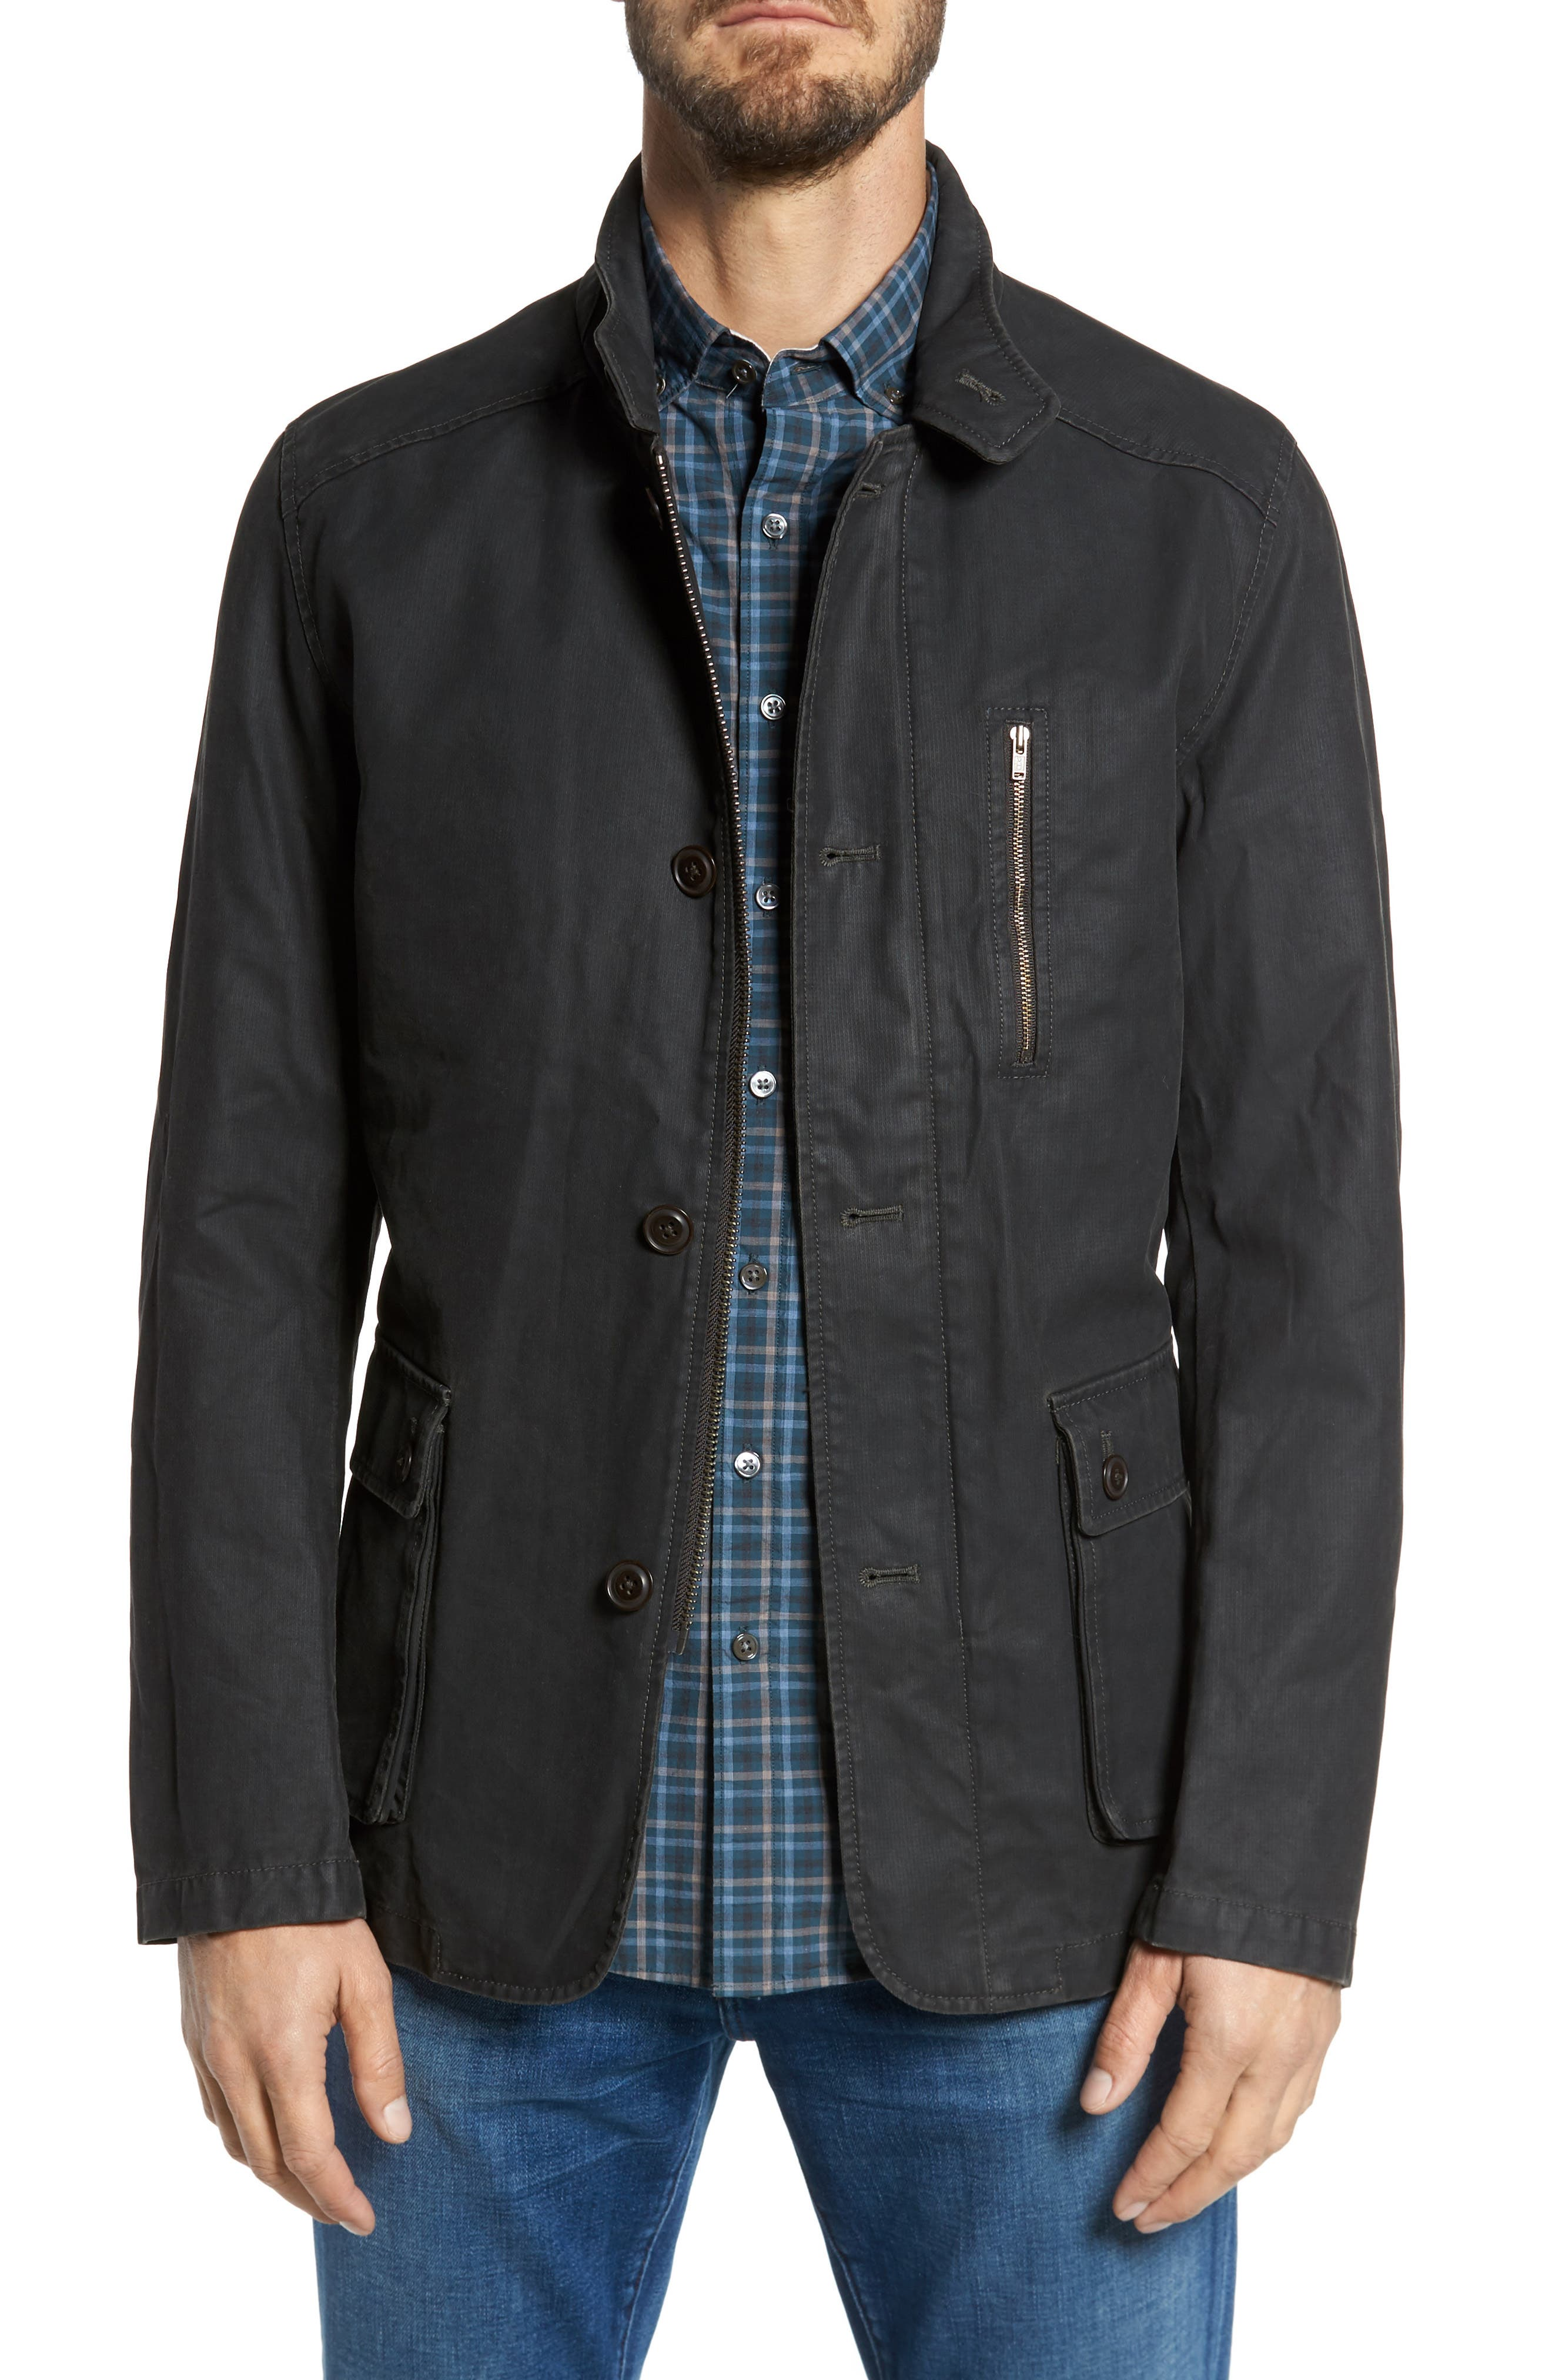 Blackmount Water-Resistant Jacket,                         Main,                         color, 302